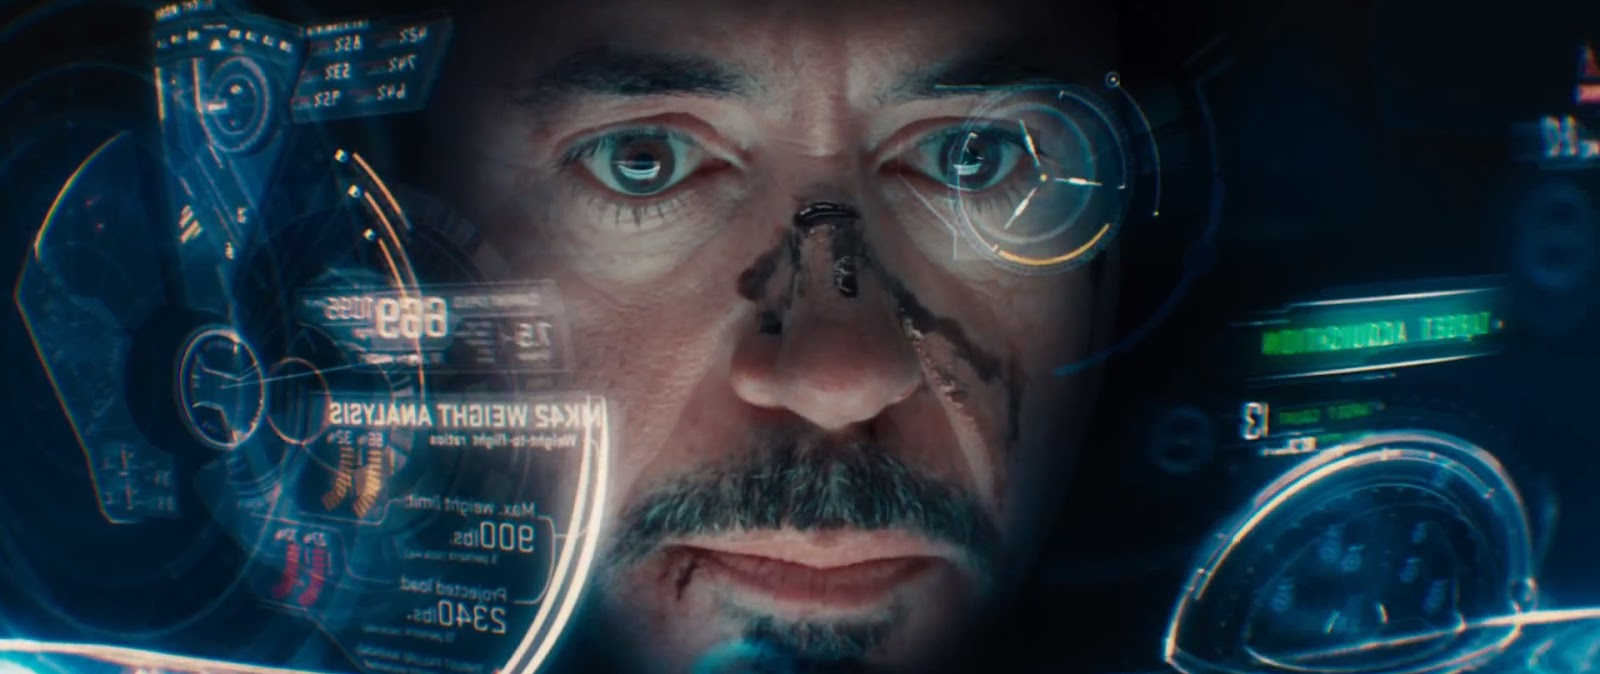 Iron-man-3-hud.jpg